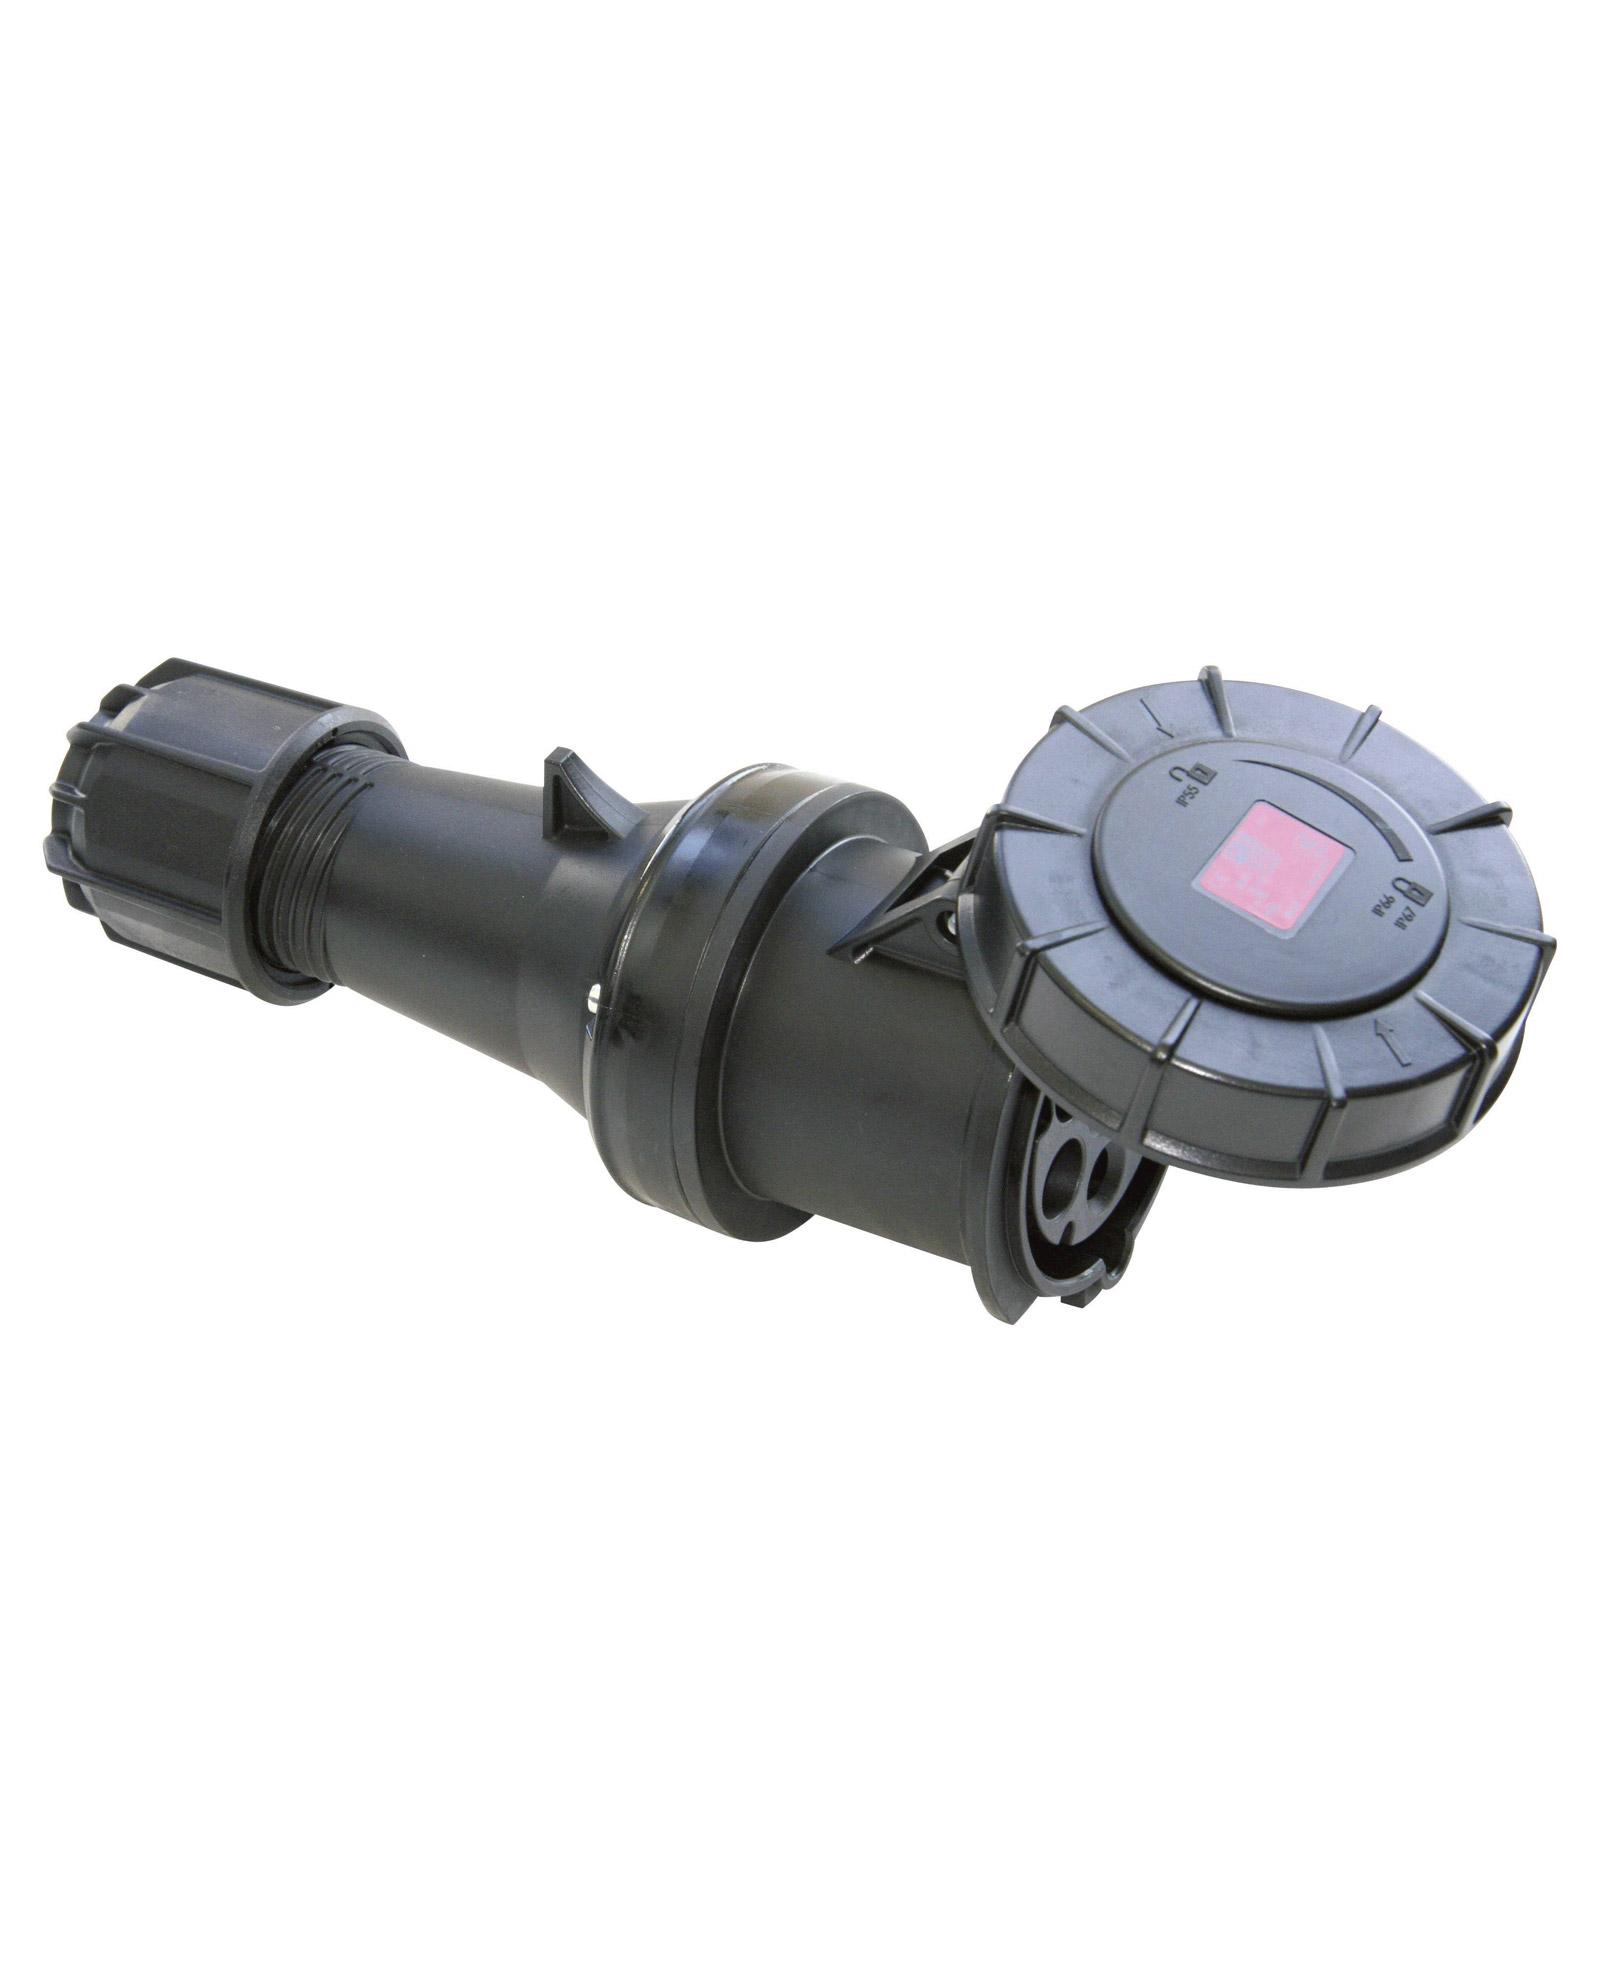 63a 5 Pin Socket Black Pce 235 6xs